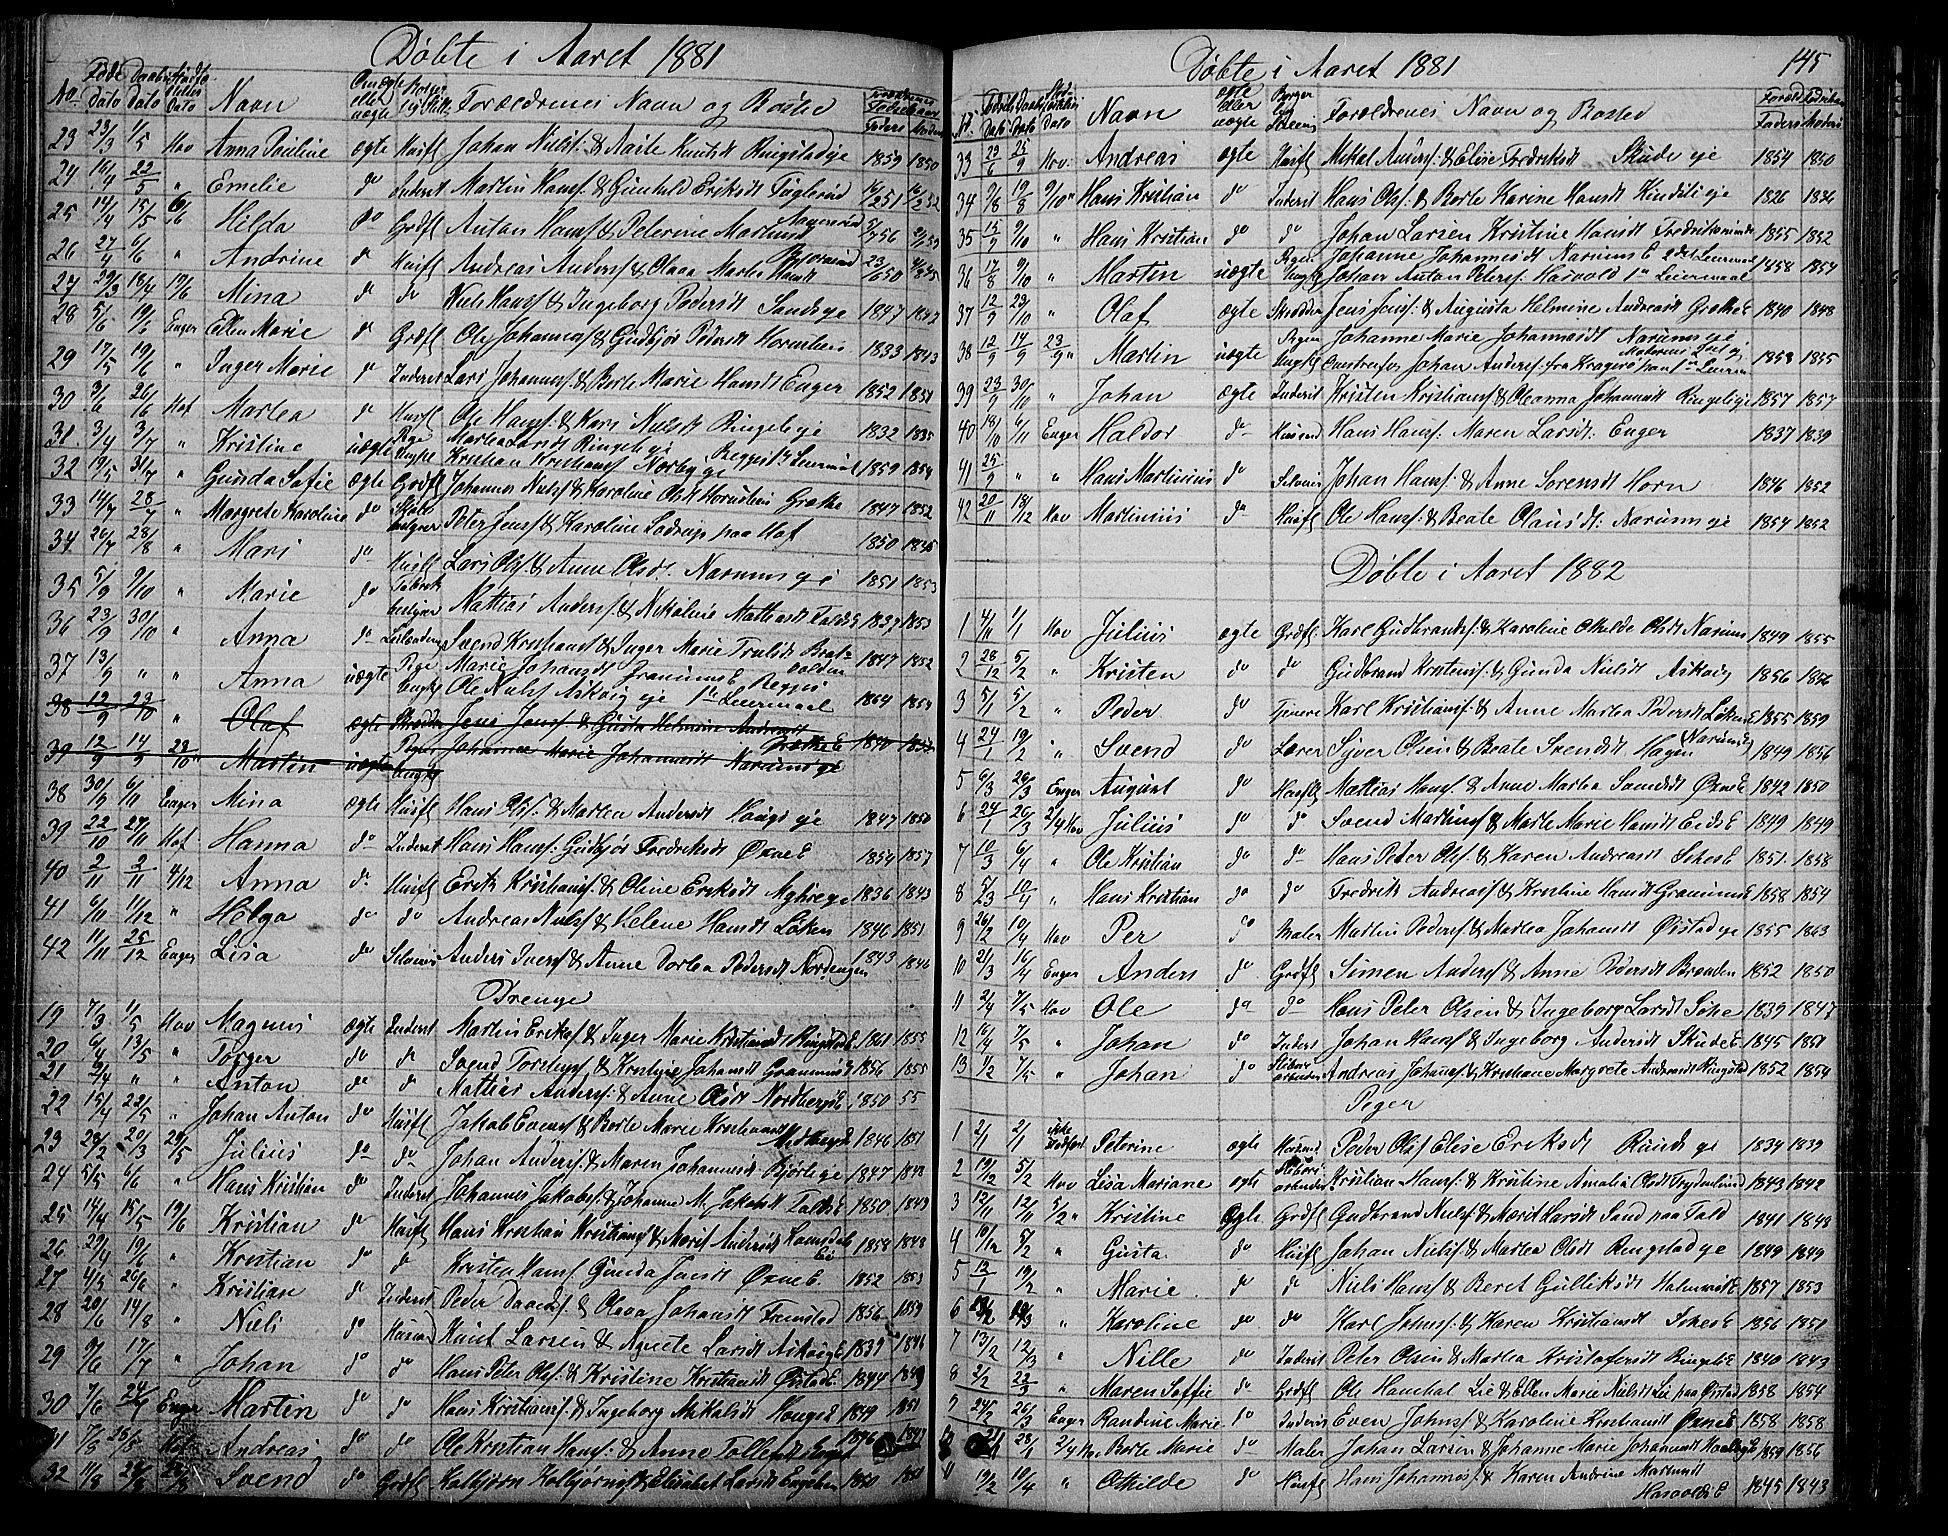 SAH, Søndre Land prestekontor, L/L0001: Klokkerbok nr. 1, 1849-1883, s. 145